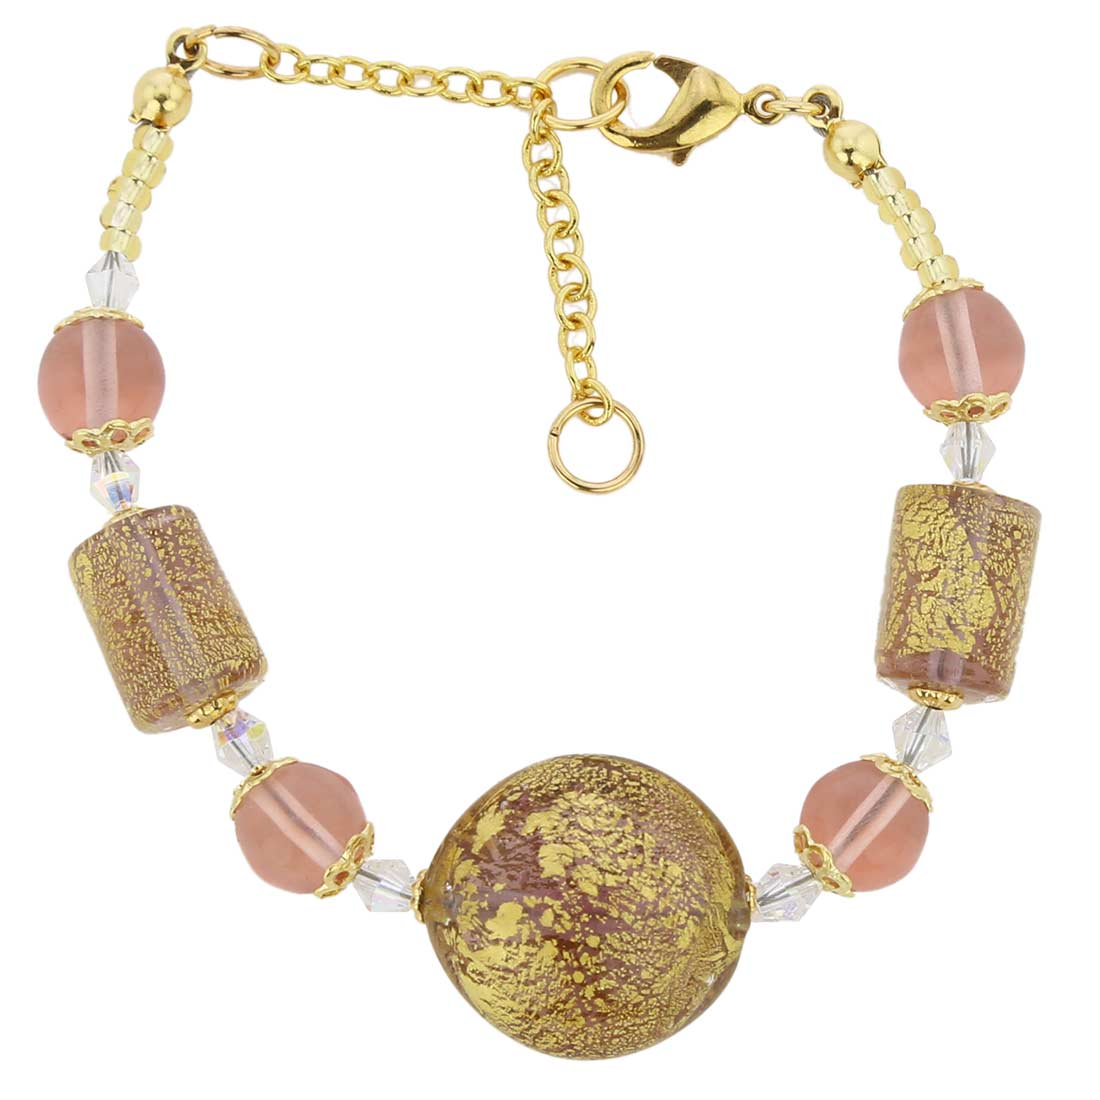 Ca D'Oro Murano Bracelet - Amethyst